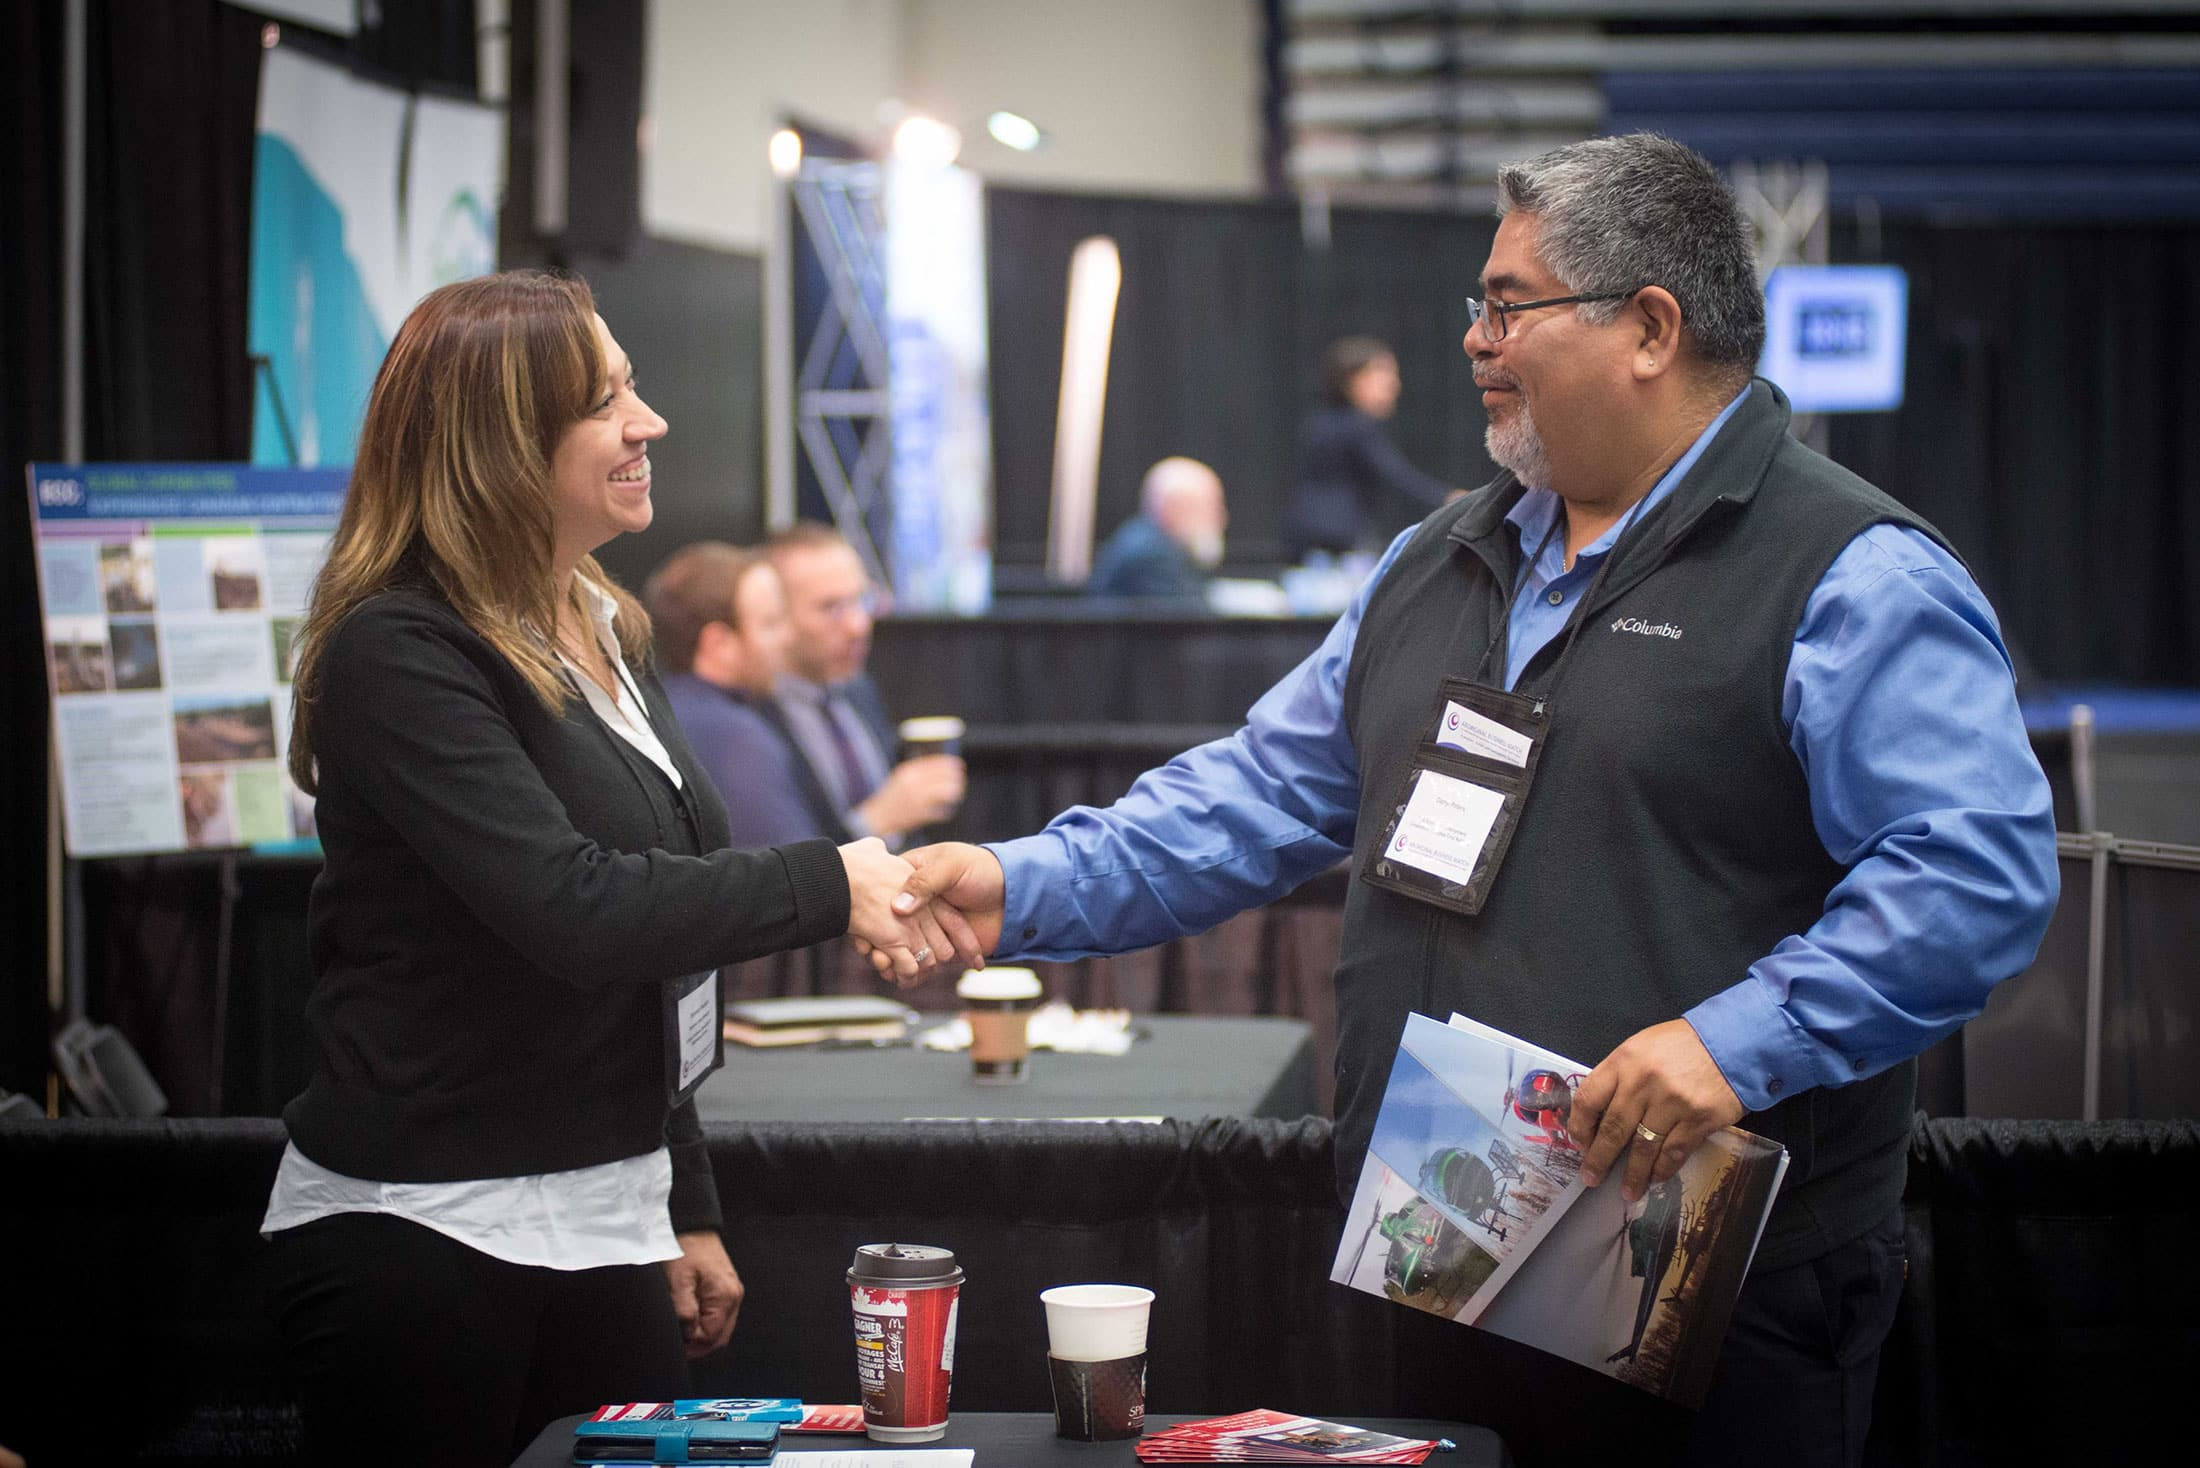 advanced business match handshake